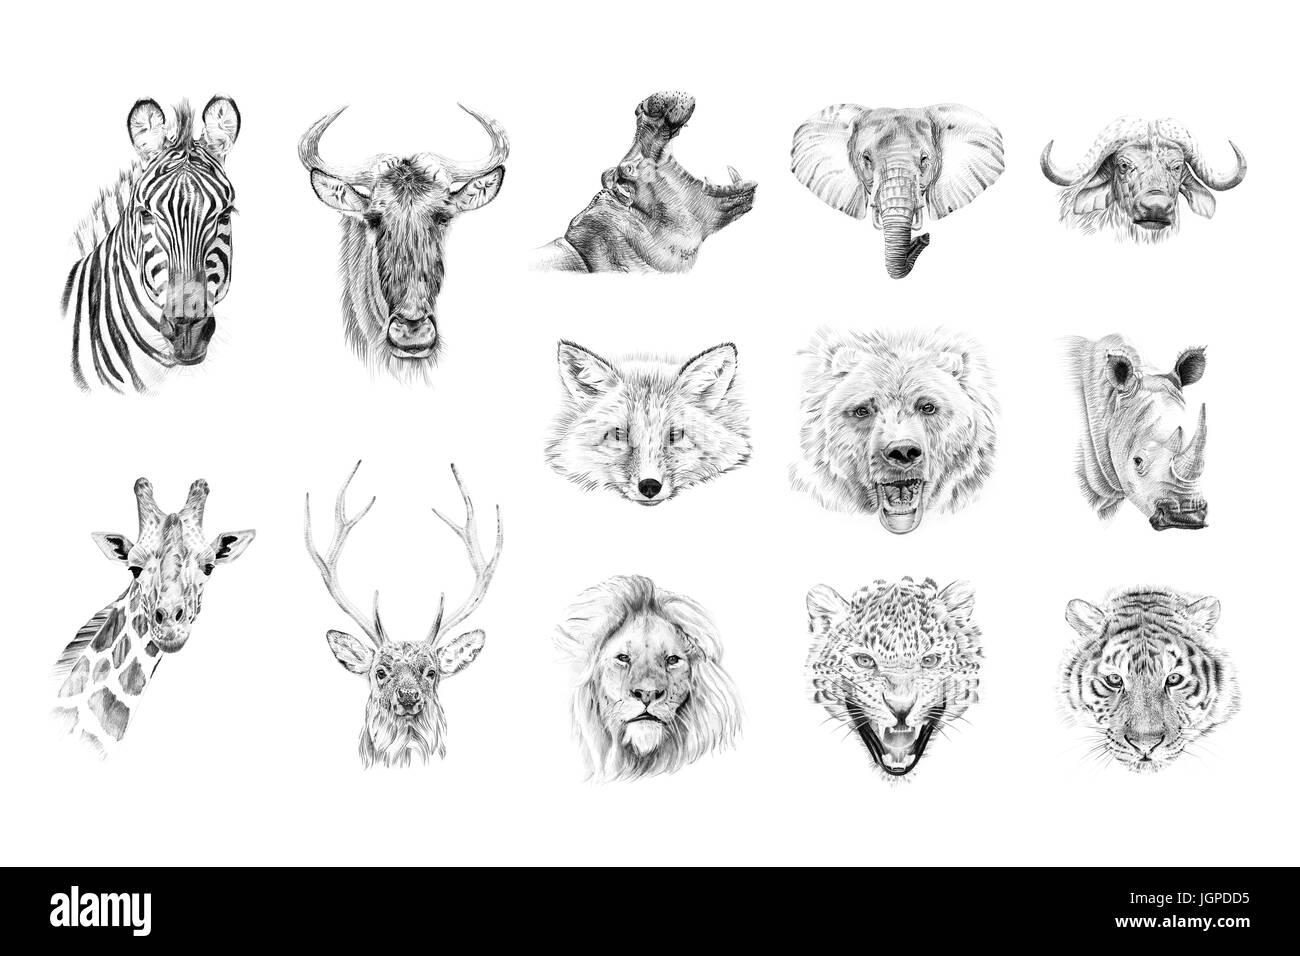 portrait of animals drawn